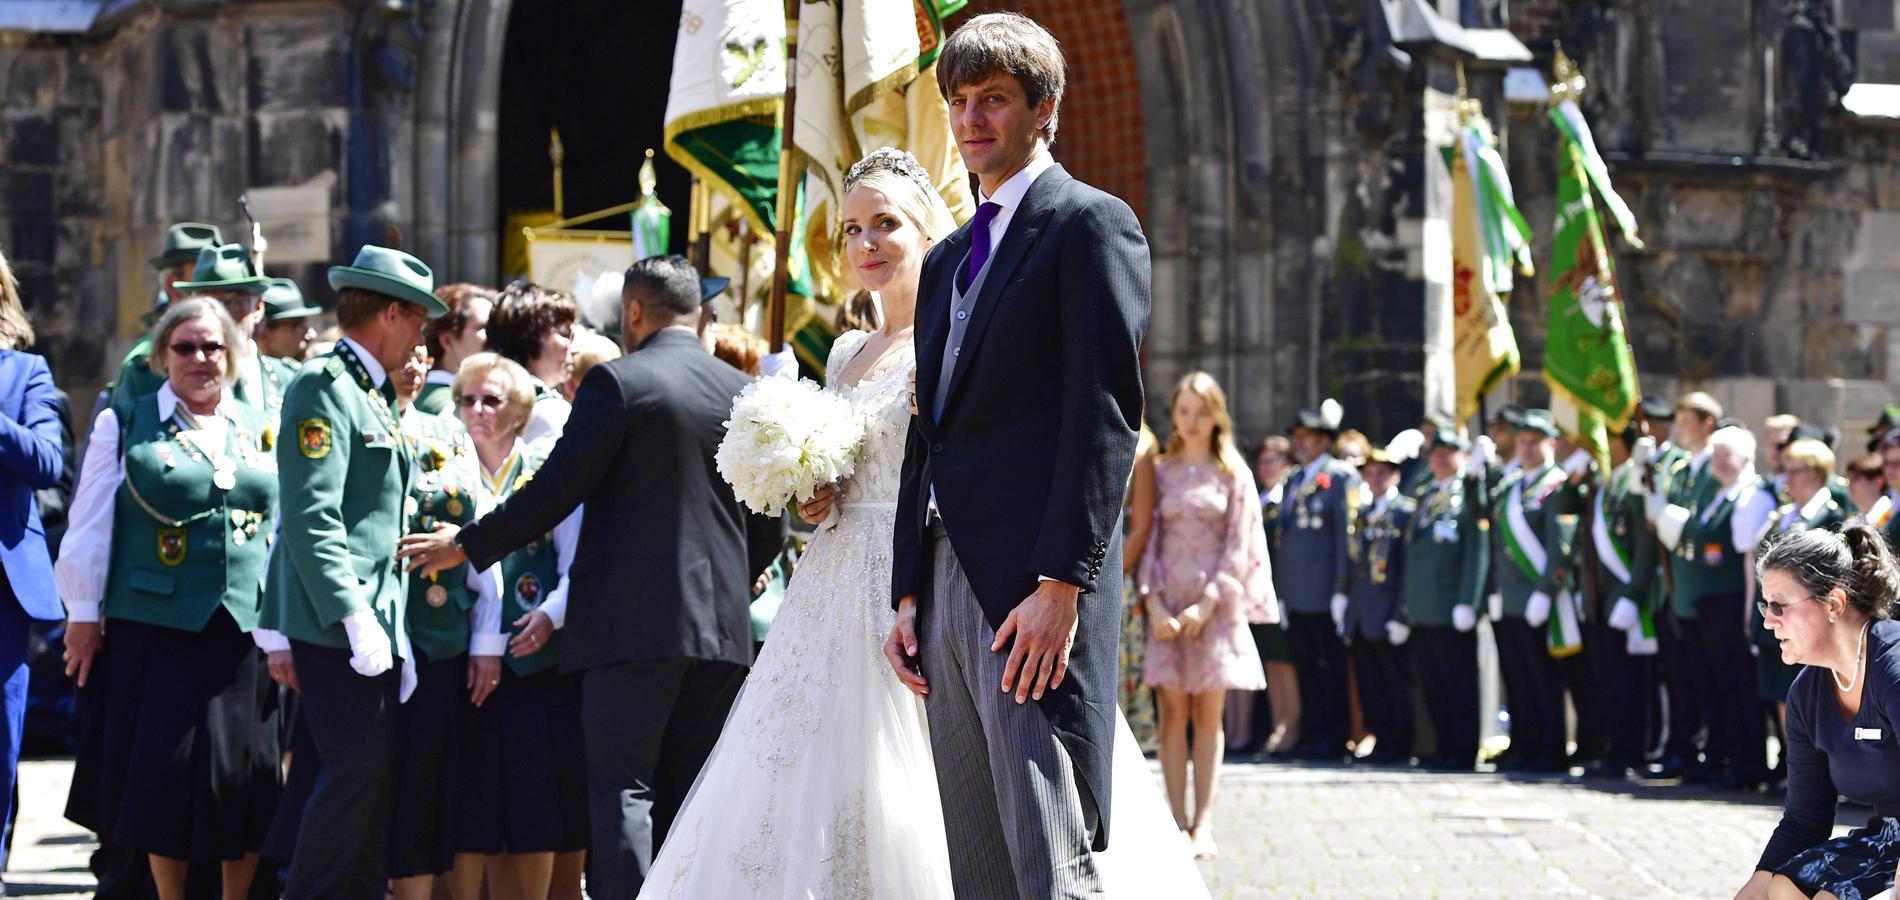 Ernst August de Hanovre Jr et Ekaterina Malysheva : mariage princier, conflit royal